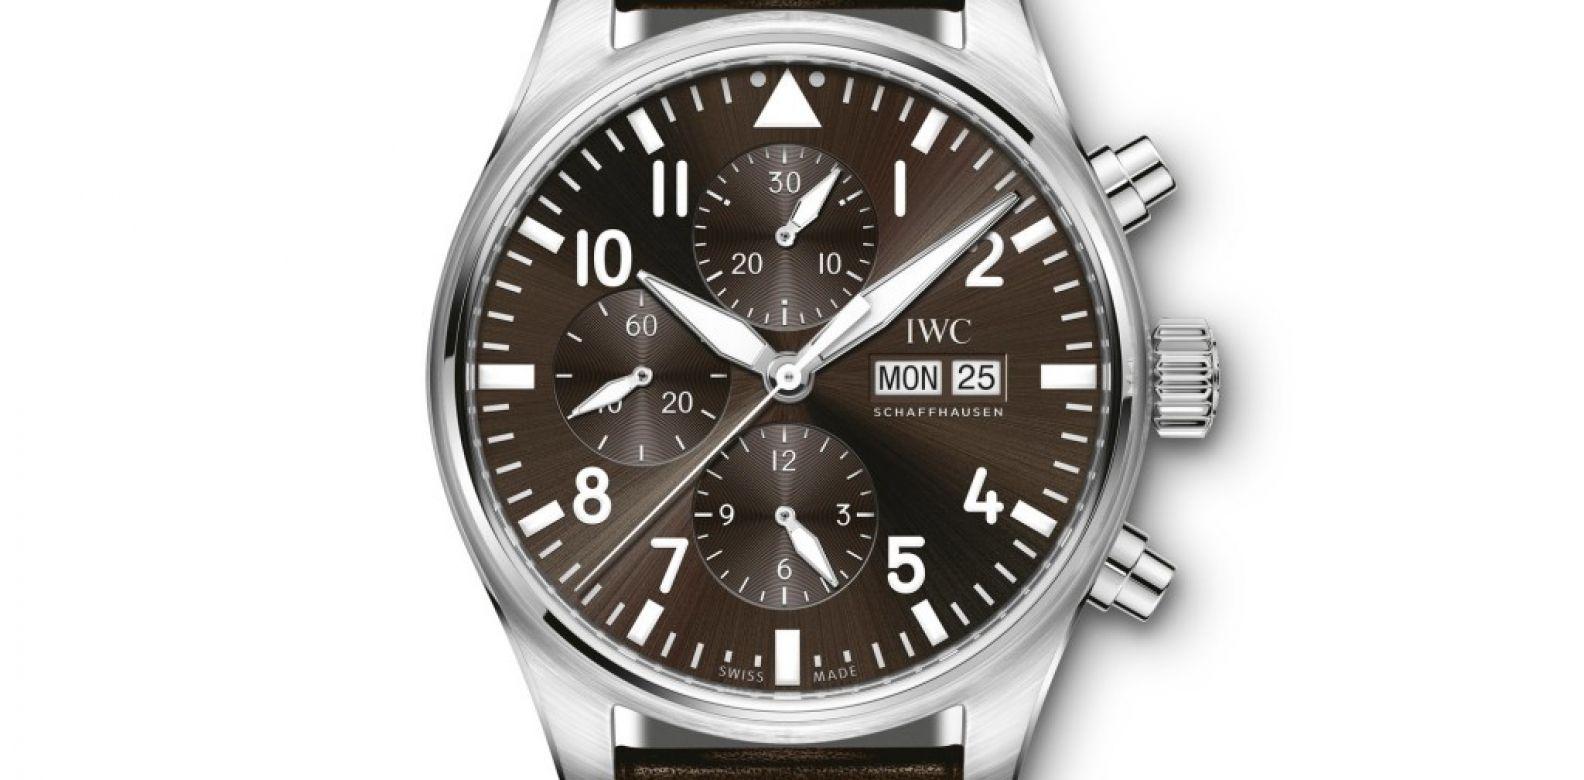 IWC Schaffhausen Pilot's Watch Chronograph Edition Antoine de Saint Exupéry